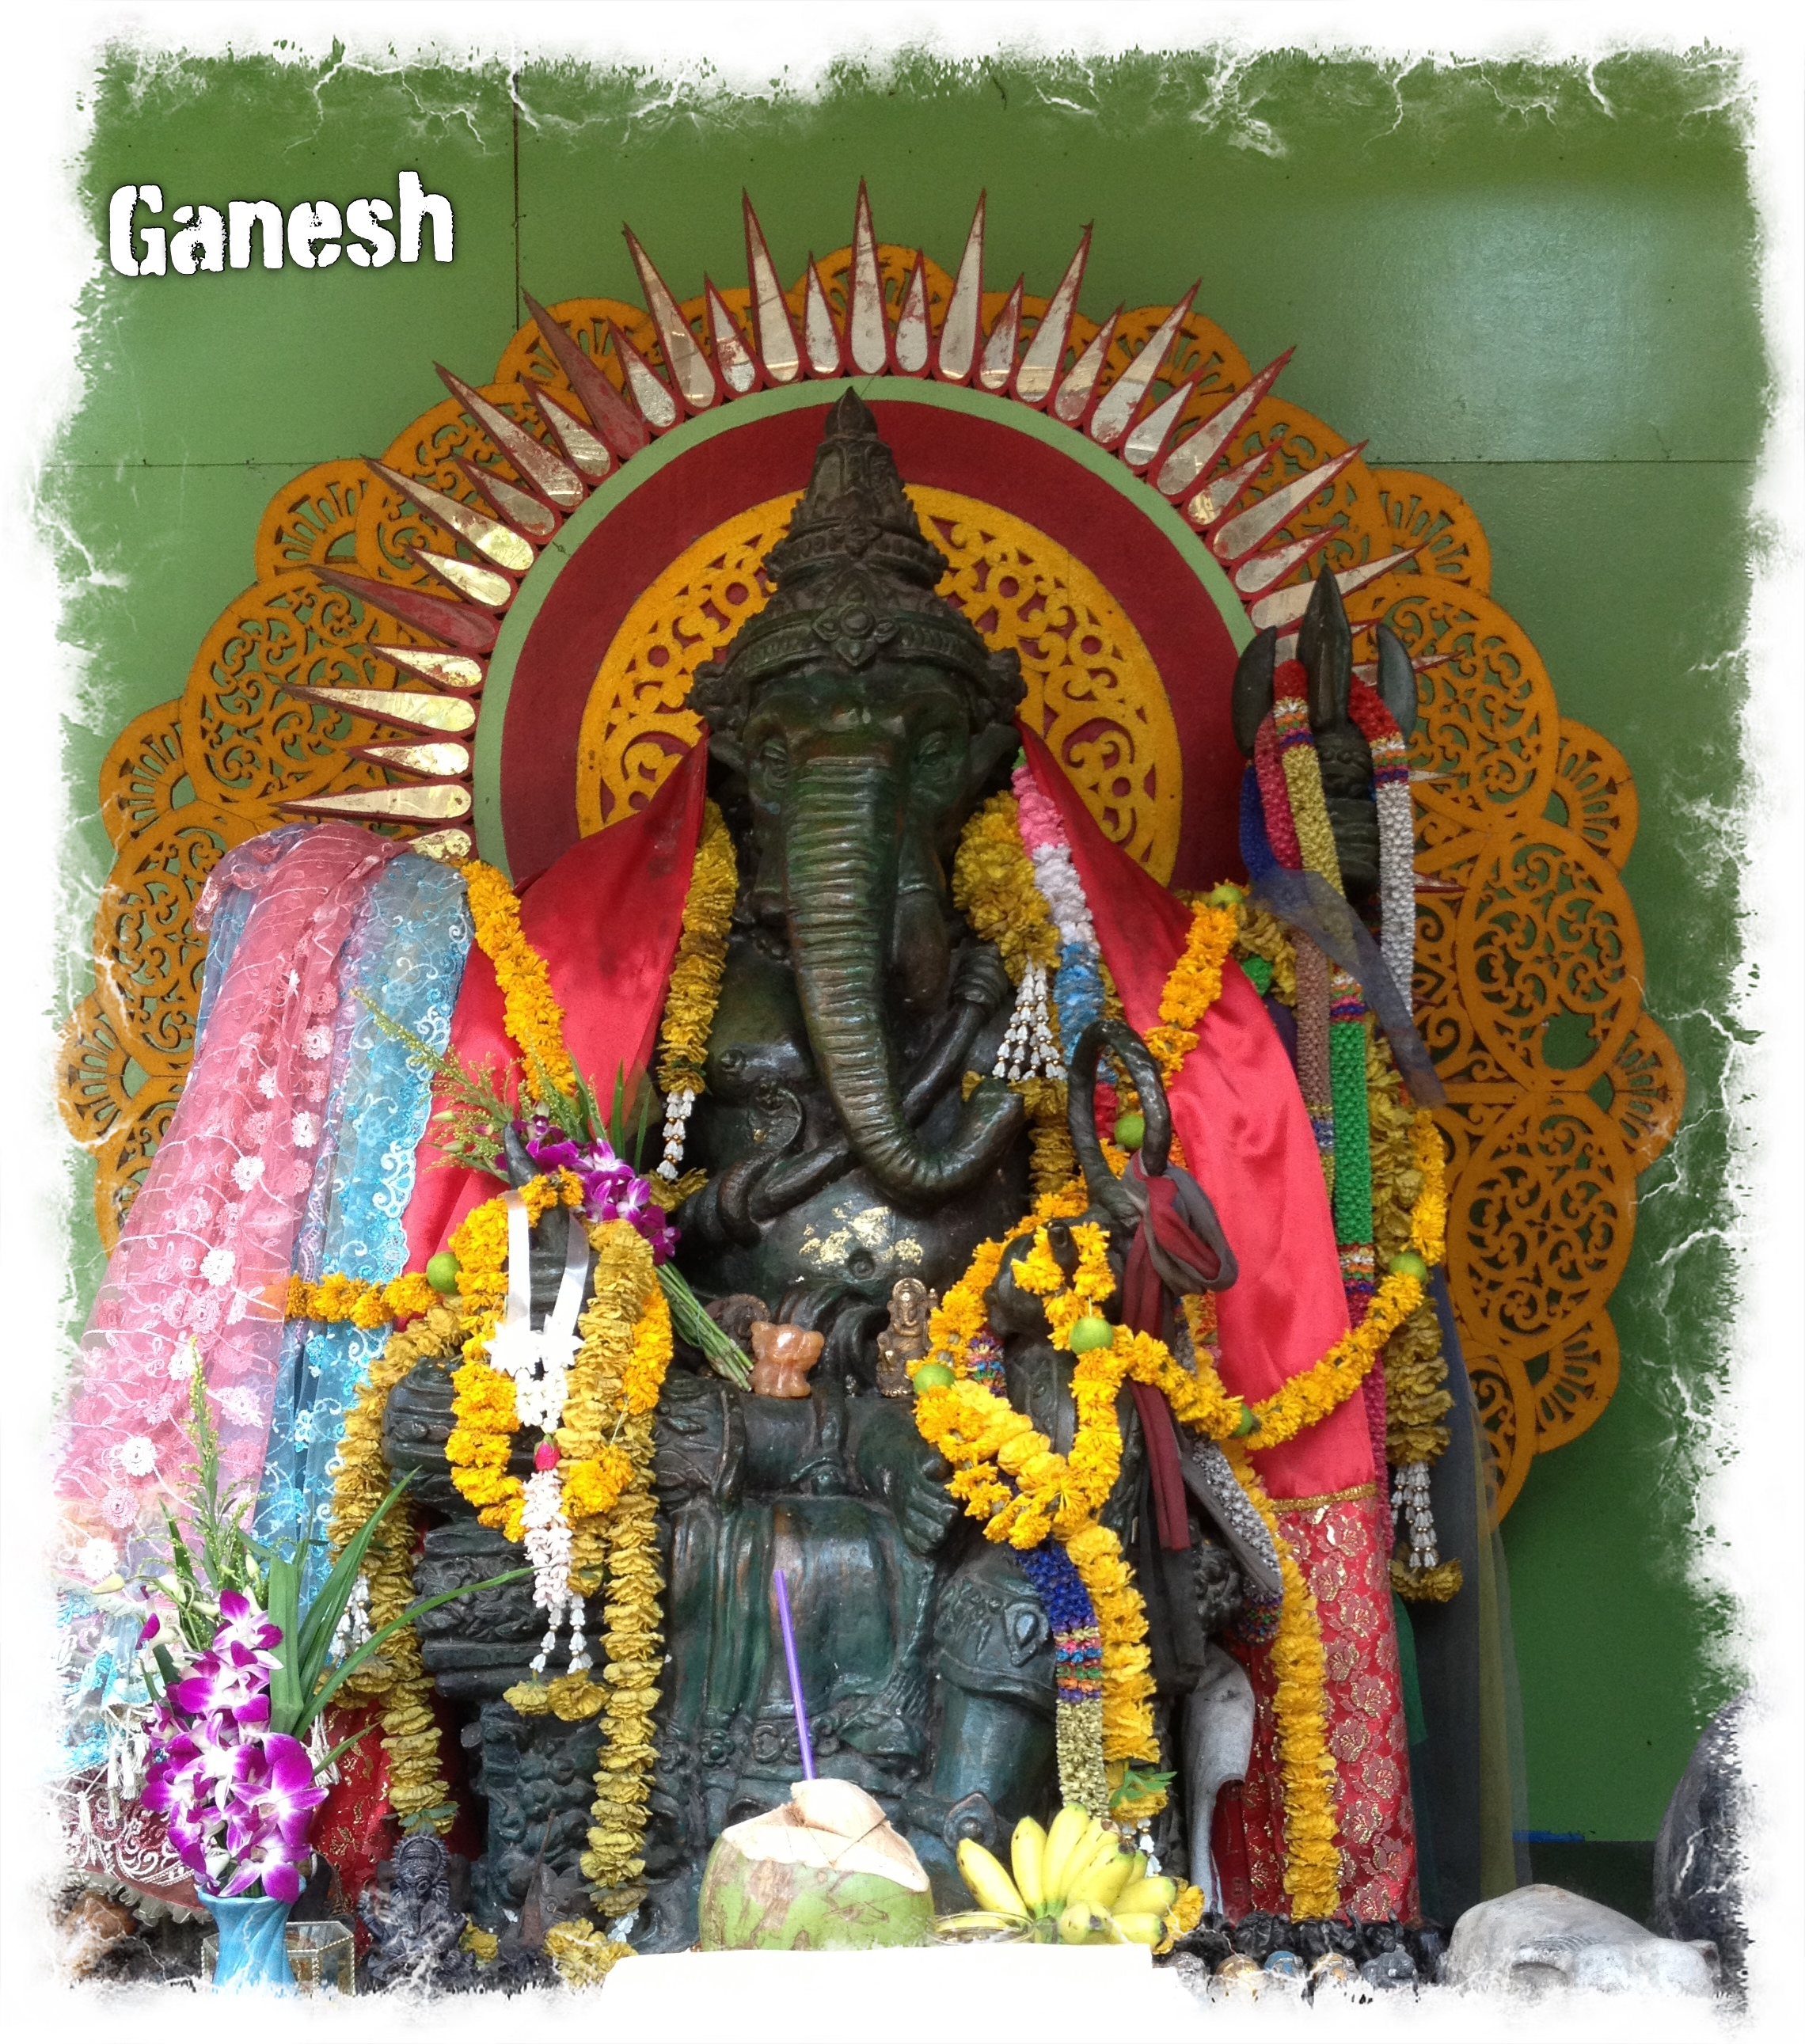 Ganash - Hindu God, Ubud Bali